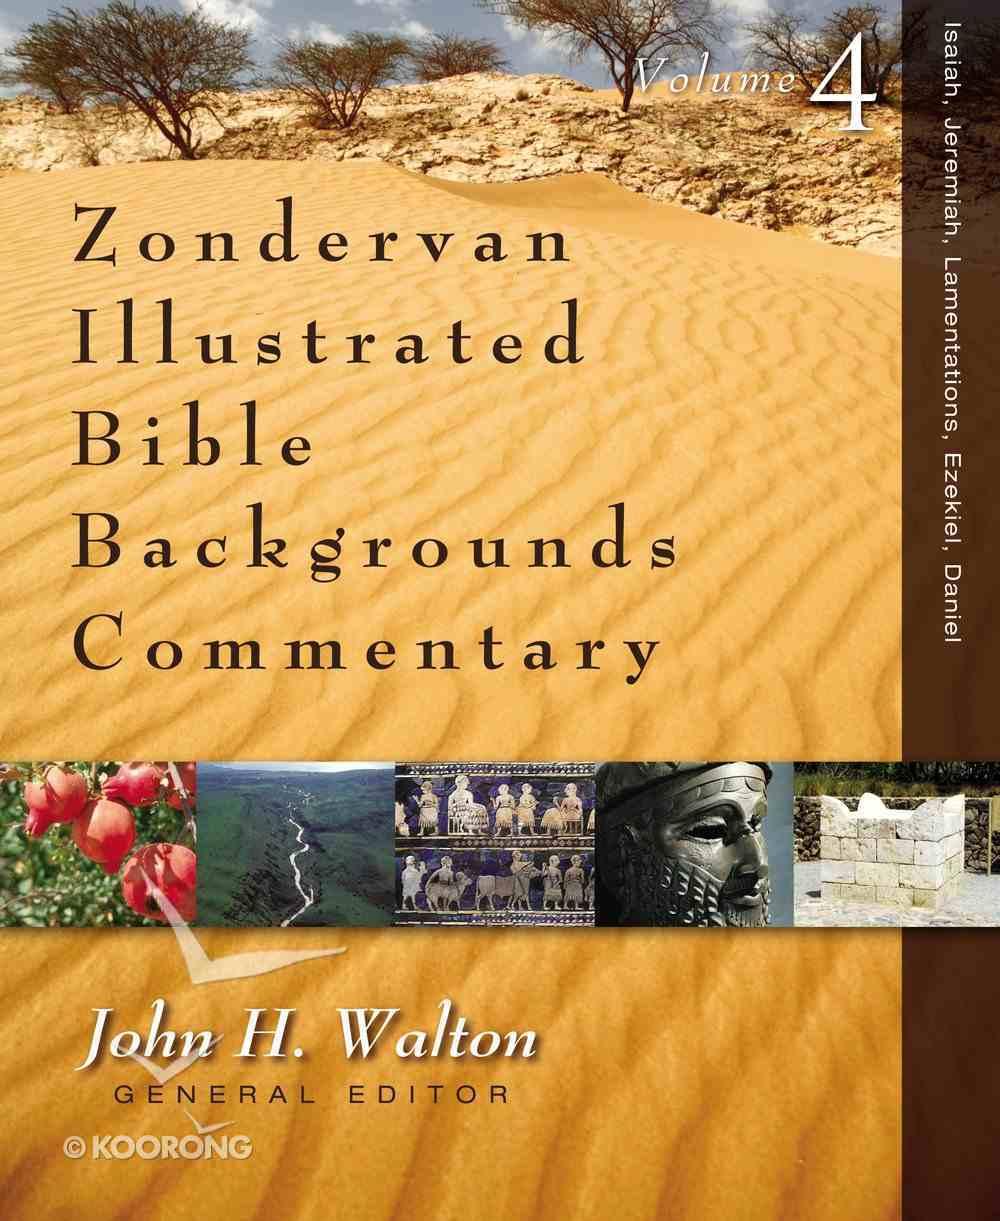 Ezekiel and Daniel (Zondervan Illustrated Bible Backgrounds Commentary Series) eBook